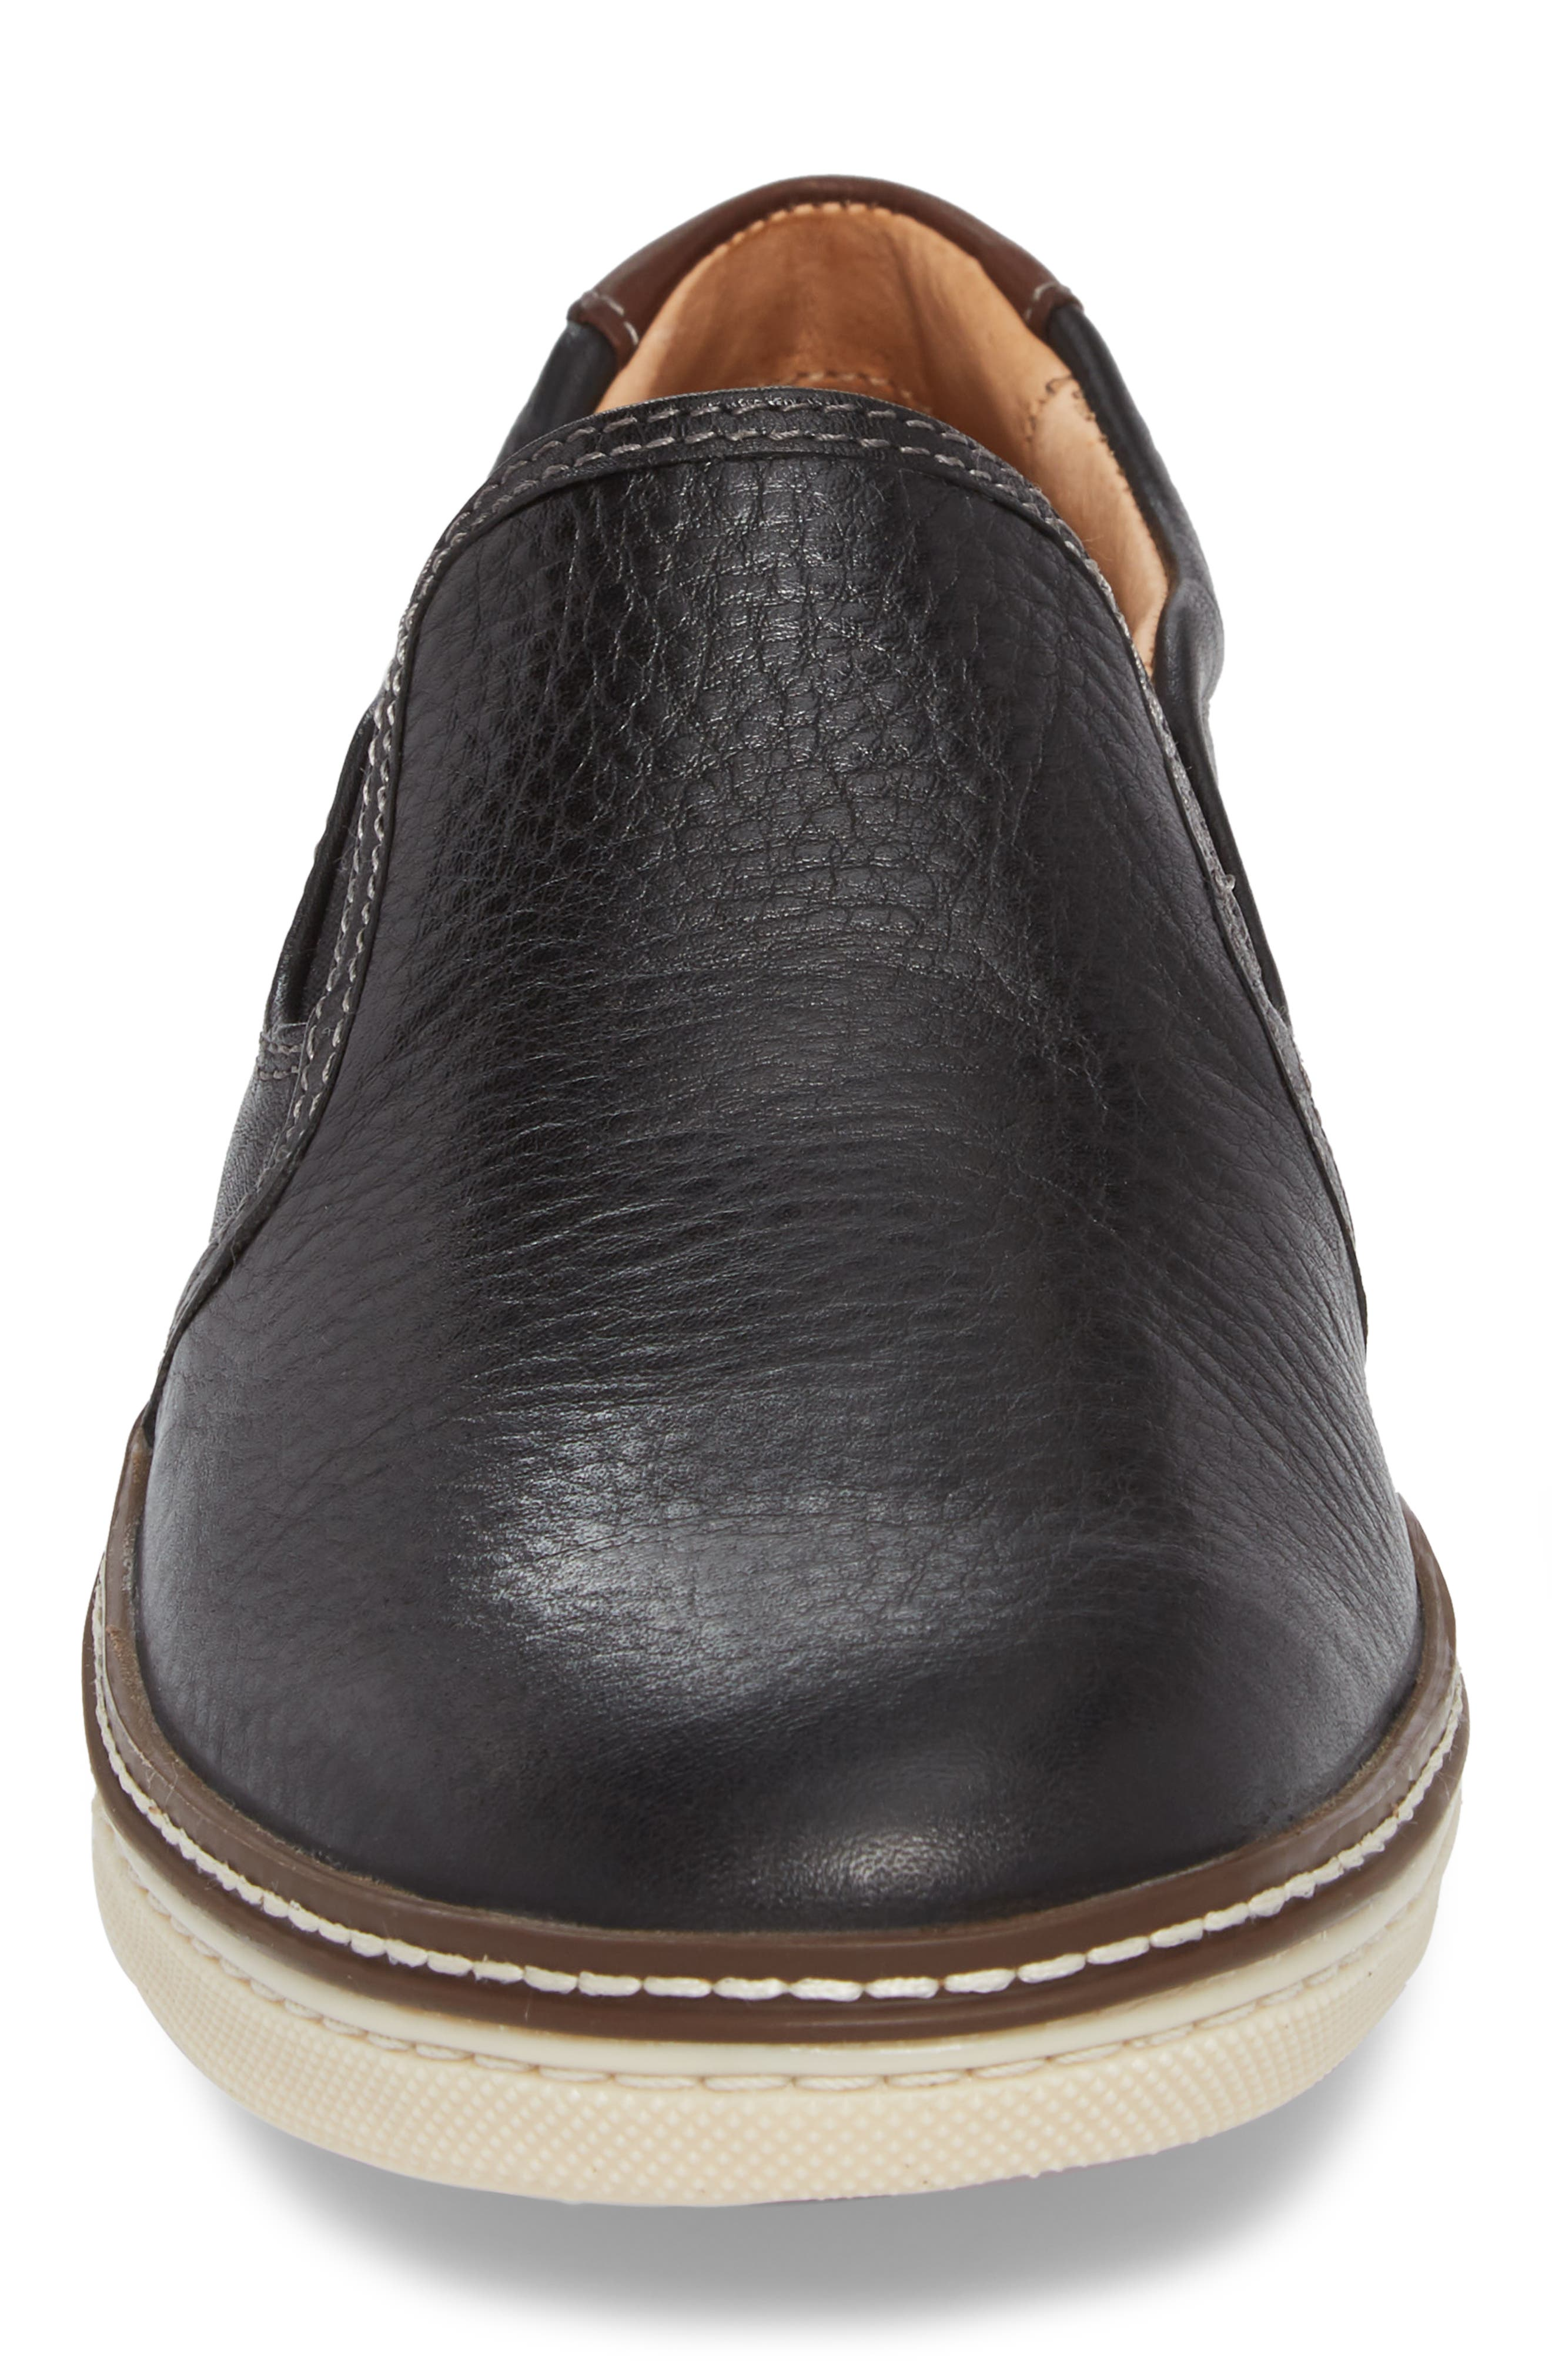 JOHNSTON & MURPHY, McGuffey Slip-On Sneaker, Alternate thumbnail 4, color, BLACK LEATHER